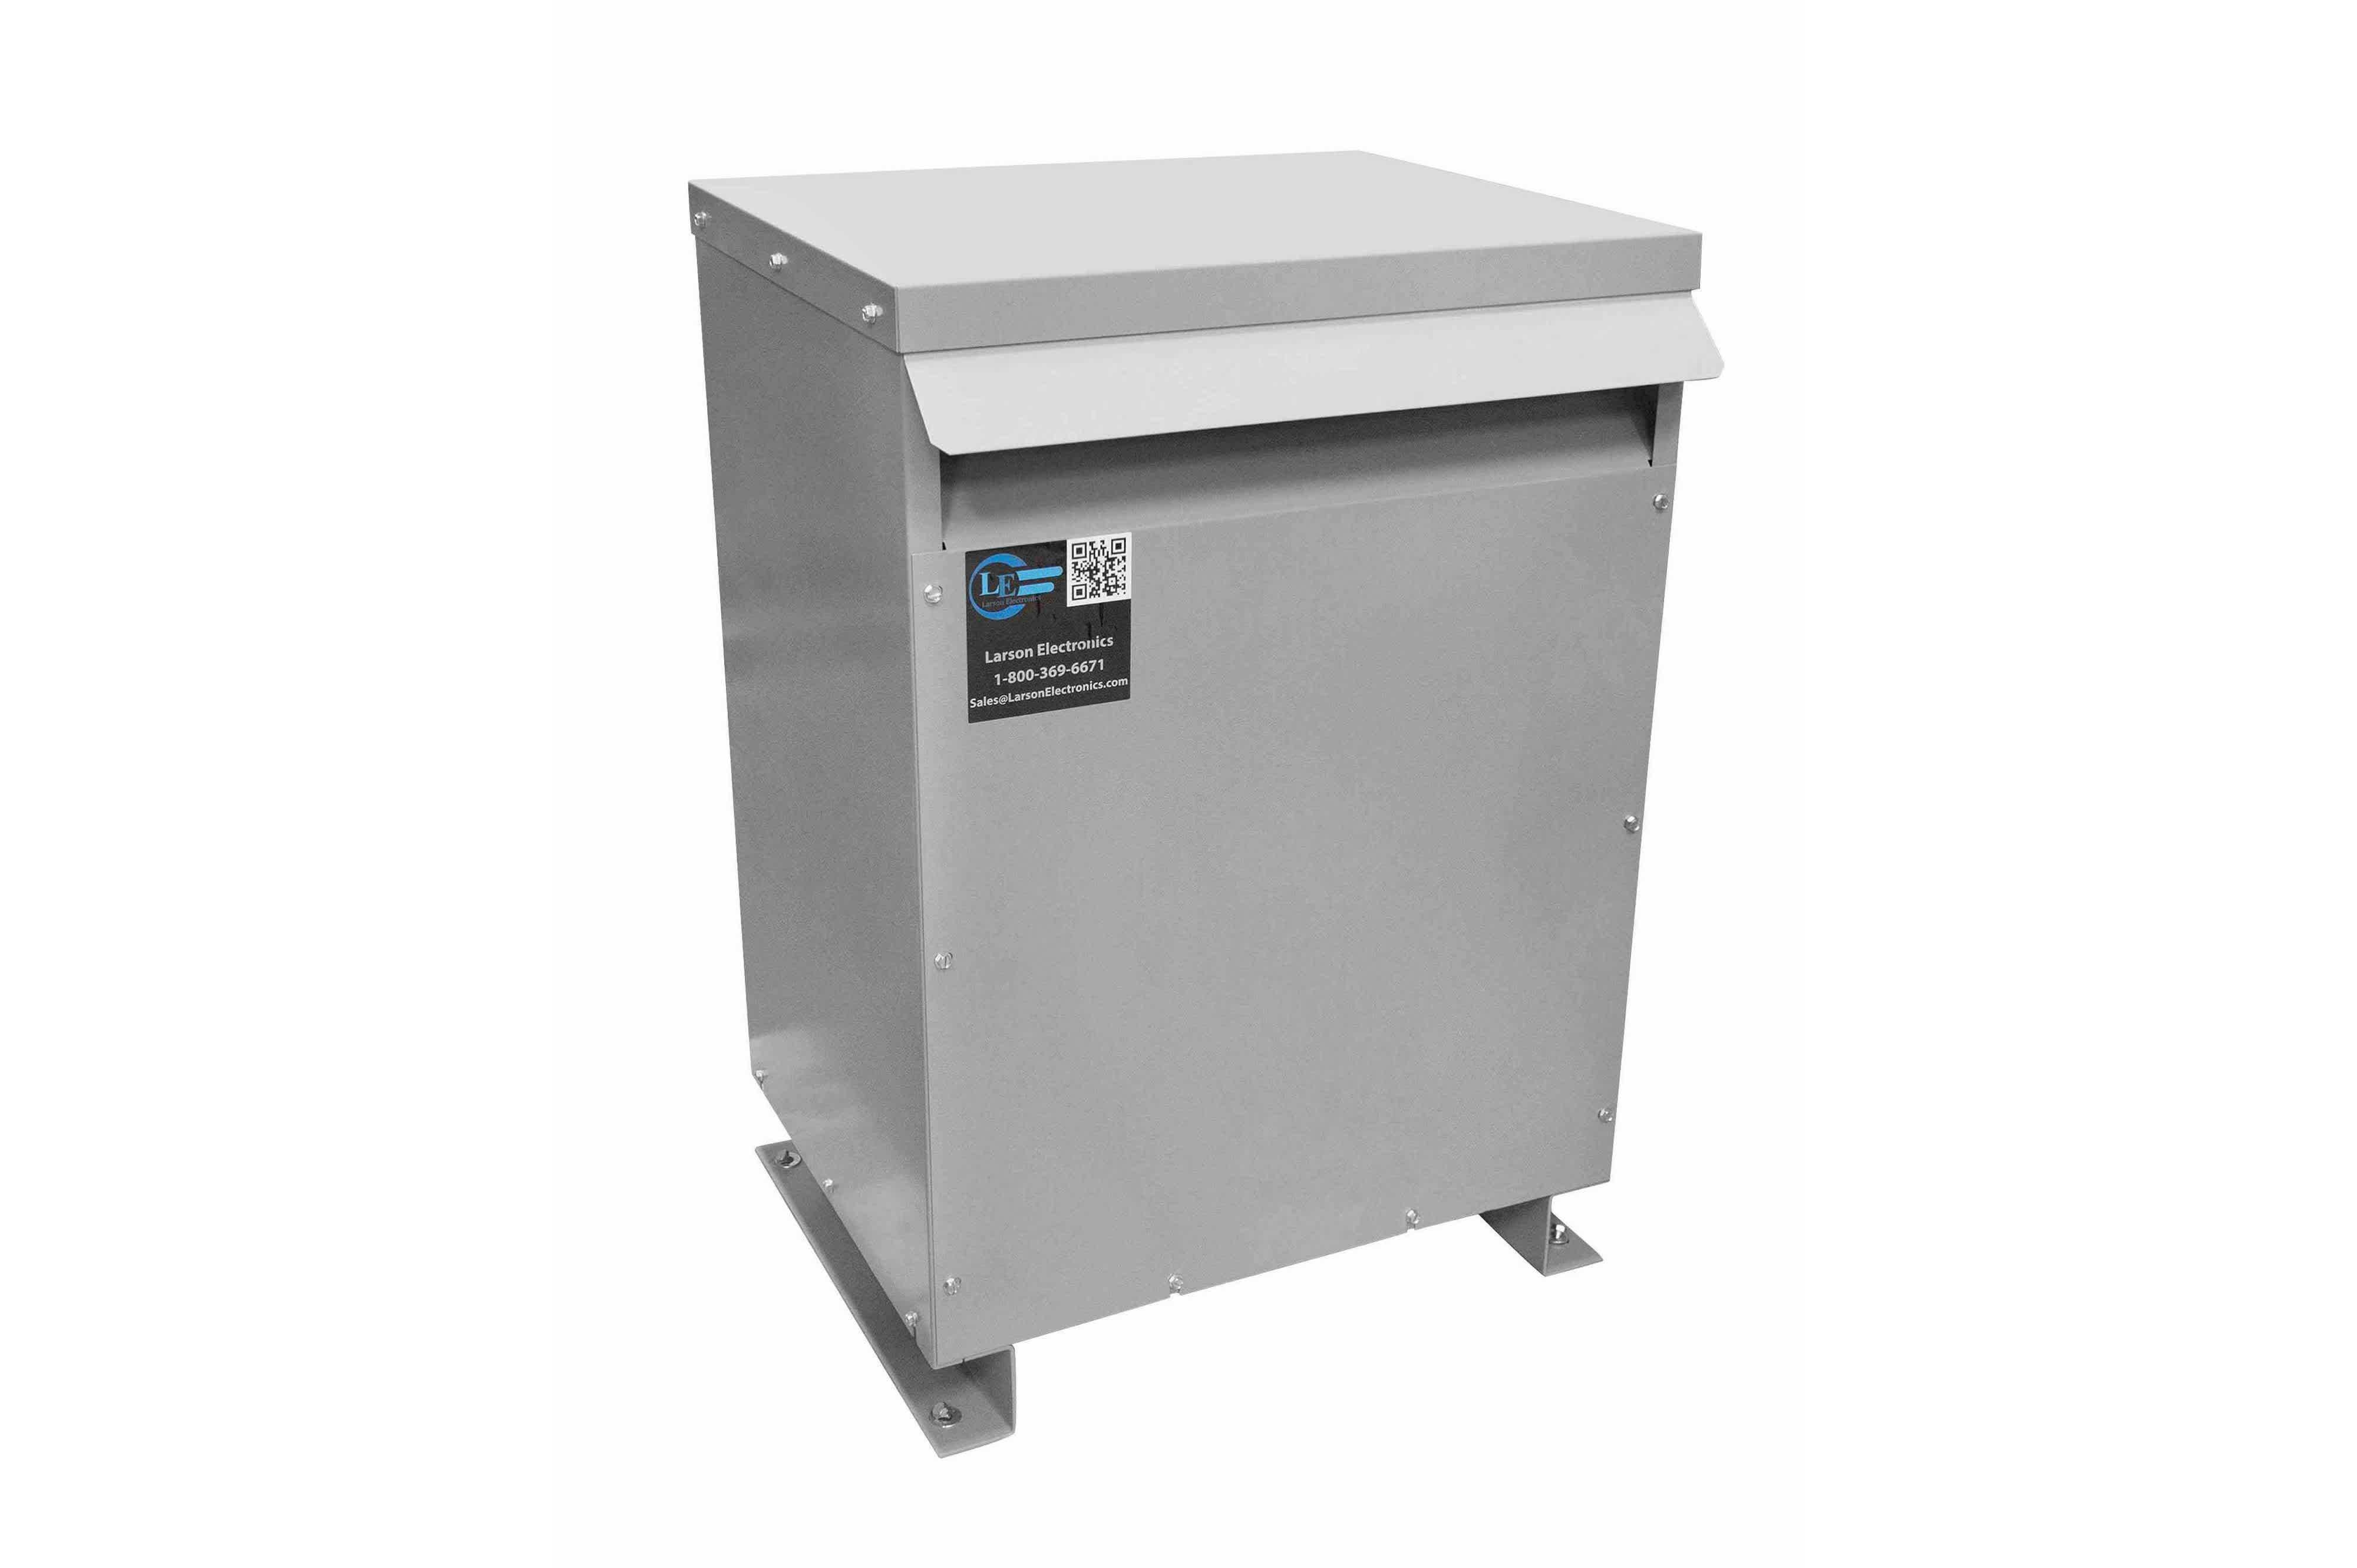 20 kVA 3PH DOE Transformer, 480V Delta Primary, 575Y/332 Wye-N Secondary, N3R, Ventilated, 60 Hz